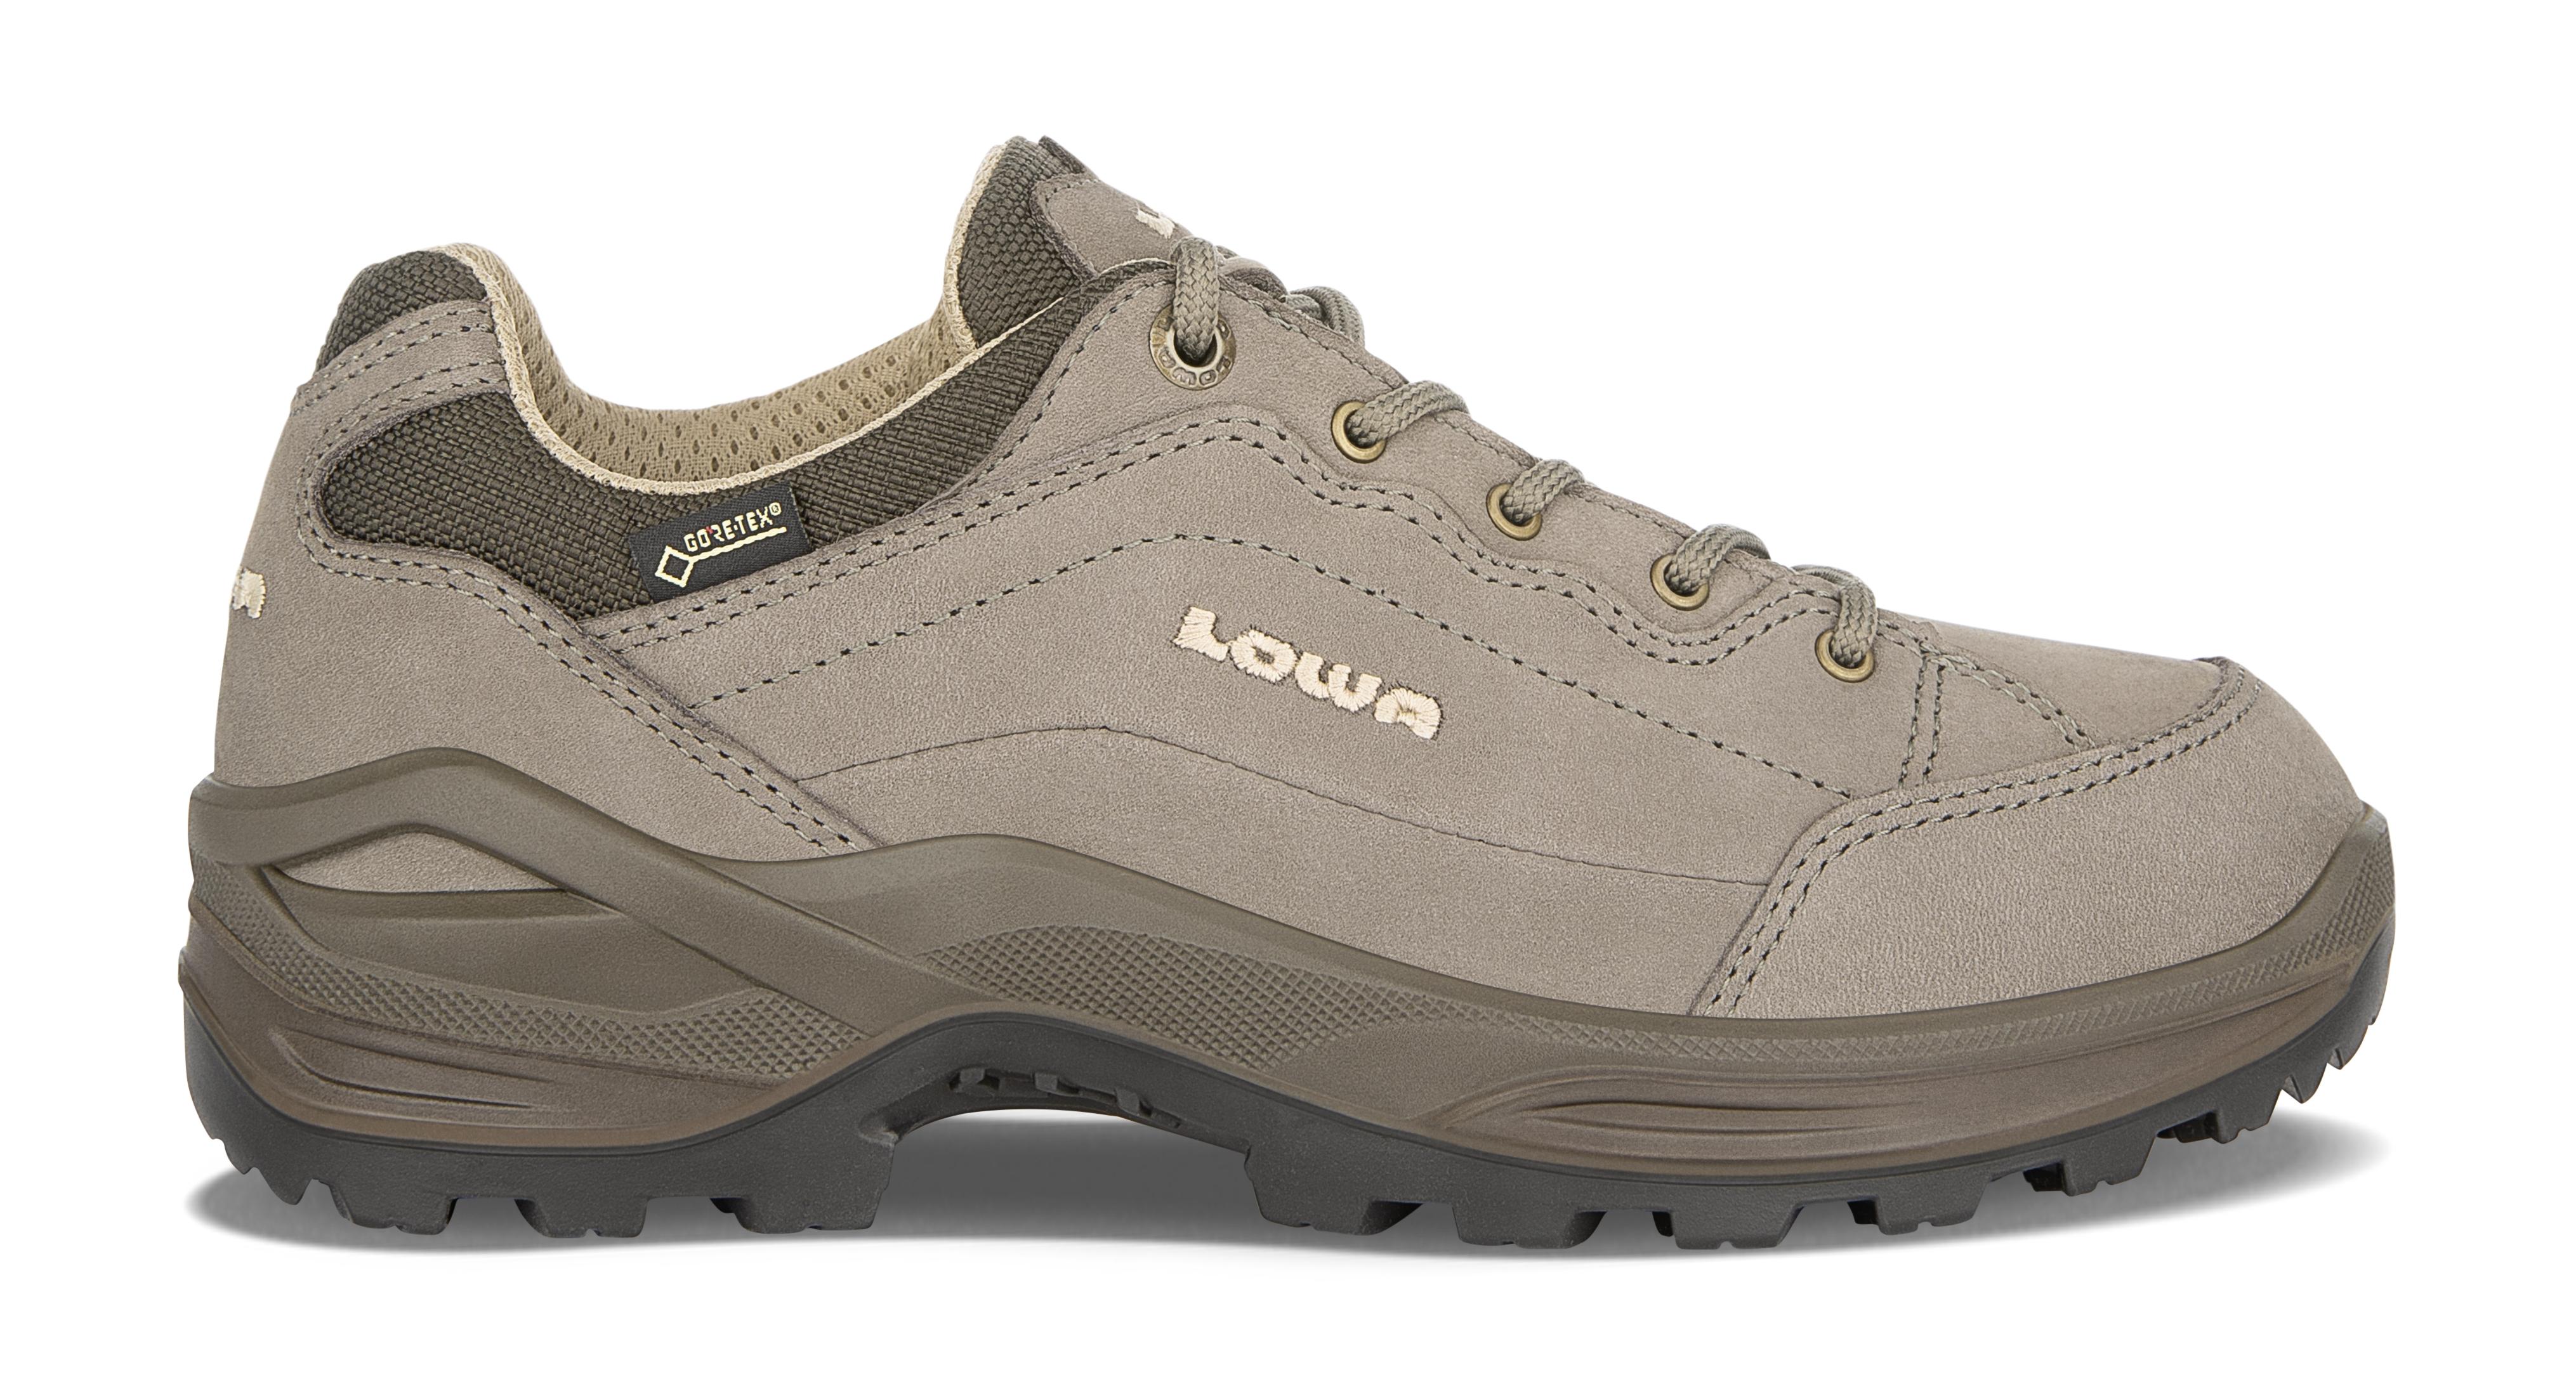 Lowa - Renegade GTX® Low Ws - Walking Boots - Women's